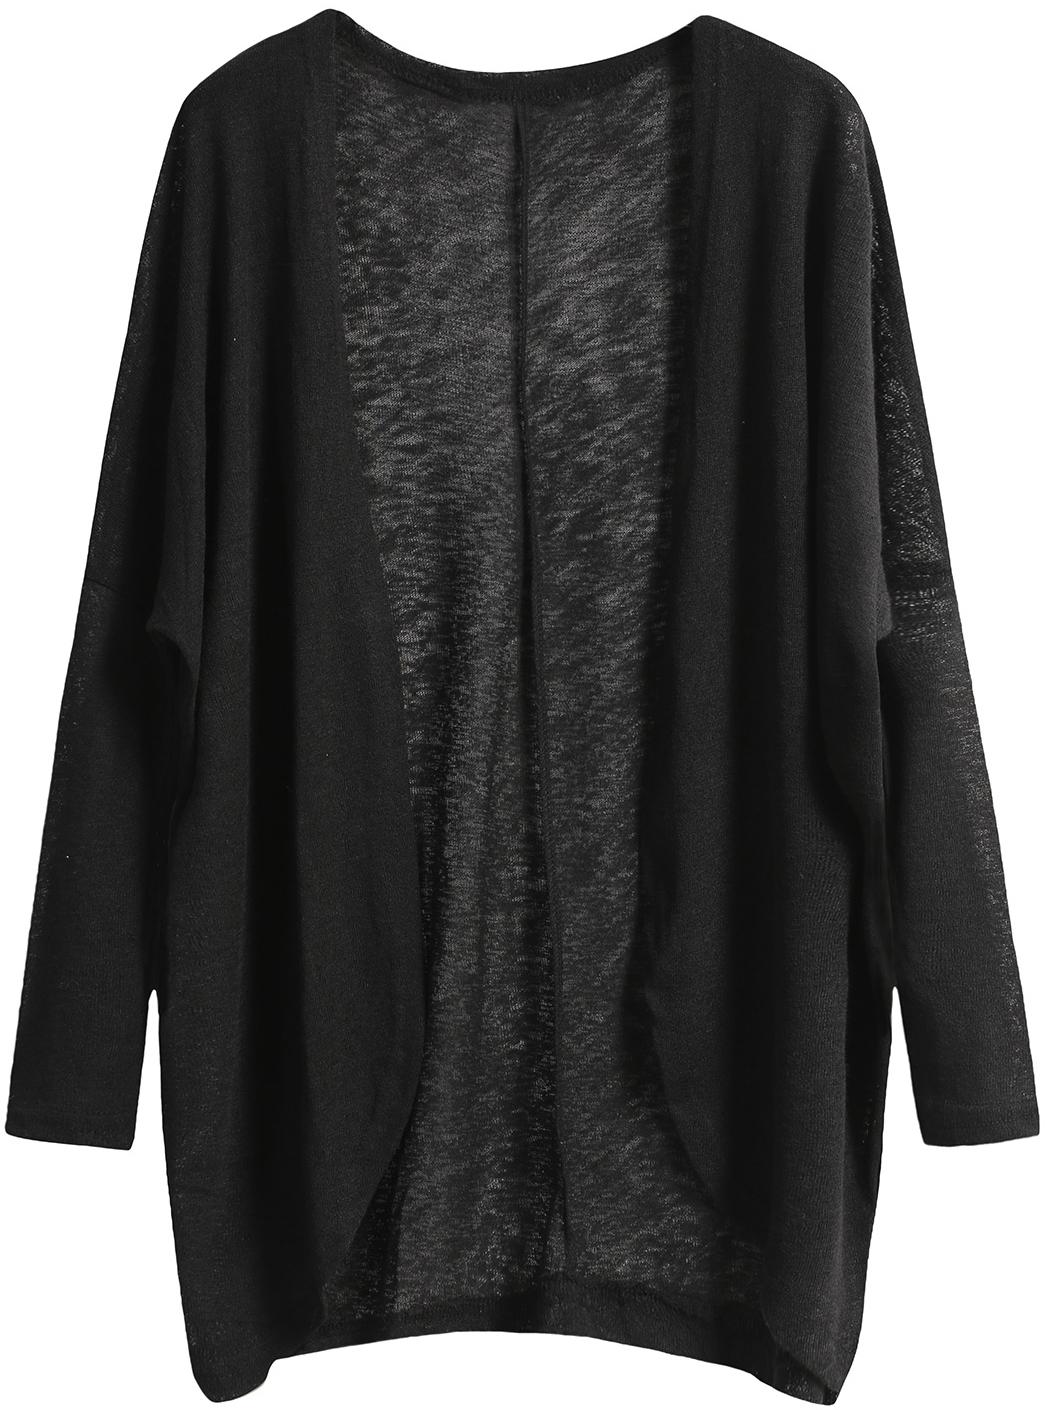 black cardigan shop black long sleeve loose knit cardigan online. shein offers black long  sleeve loose cyykspg